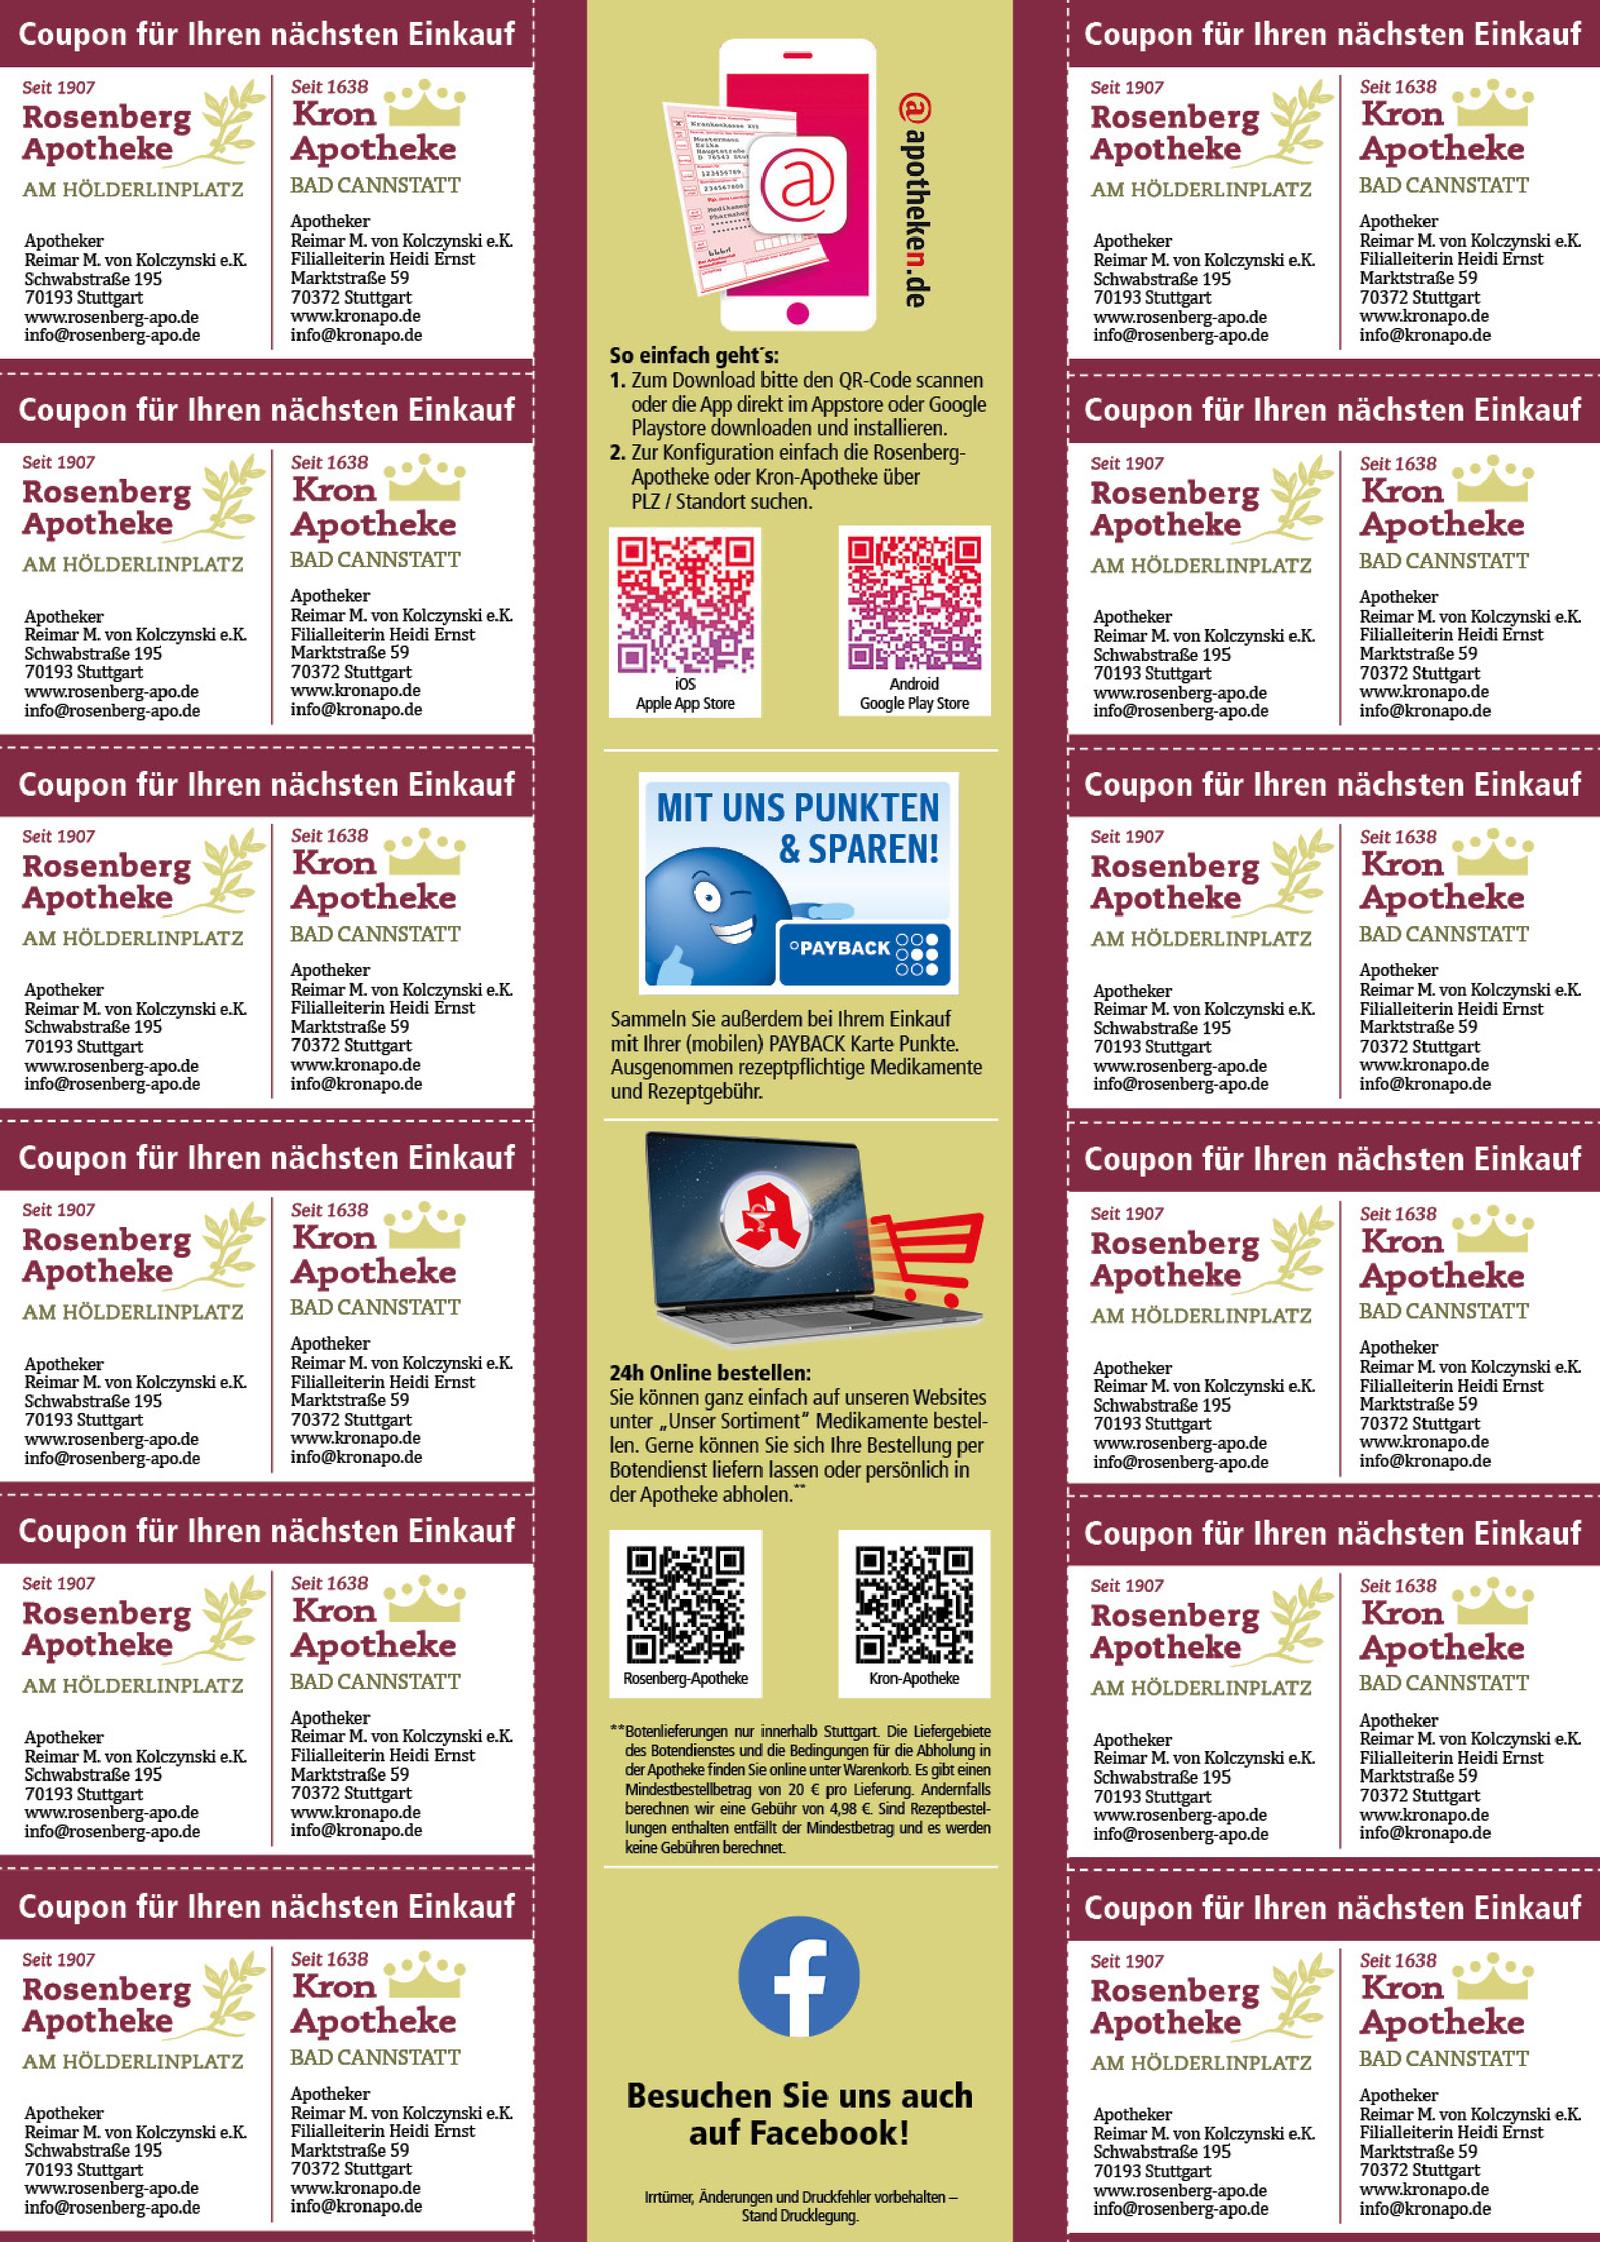 https://mein-uploads.apocdn.net/19199/leaflets/19199_flyer-Seite2.png